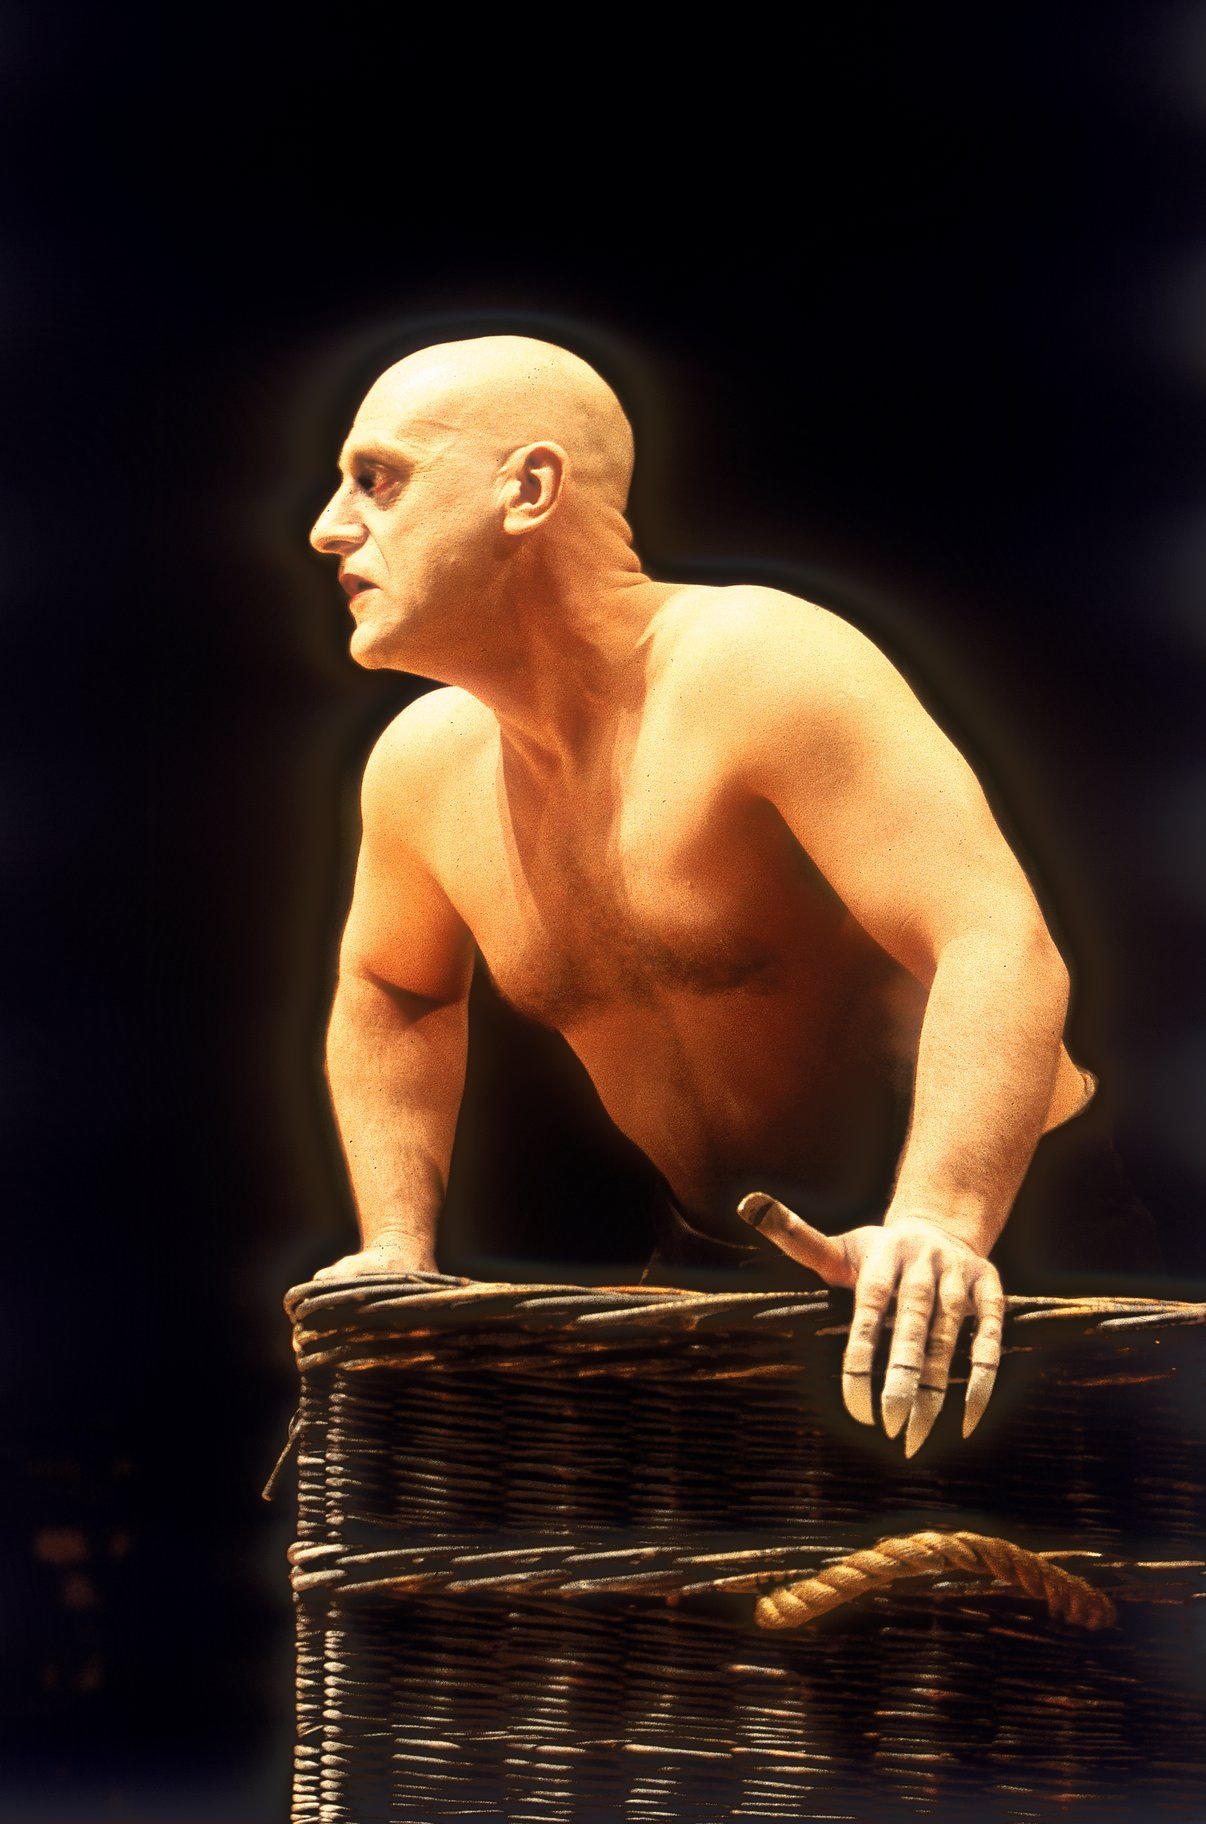 David Troughton as Caliban, rising out of a wicker basket.